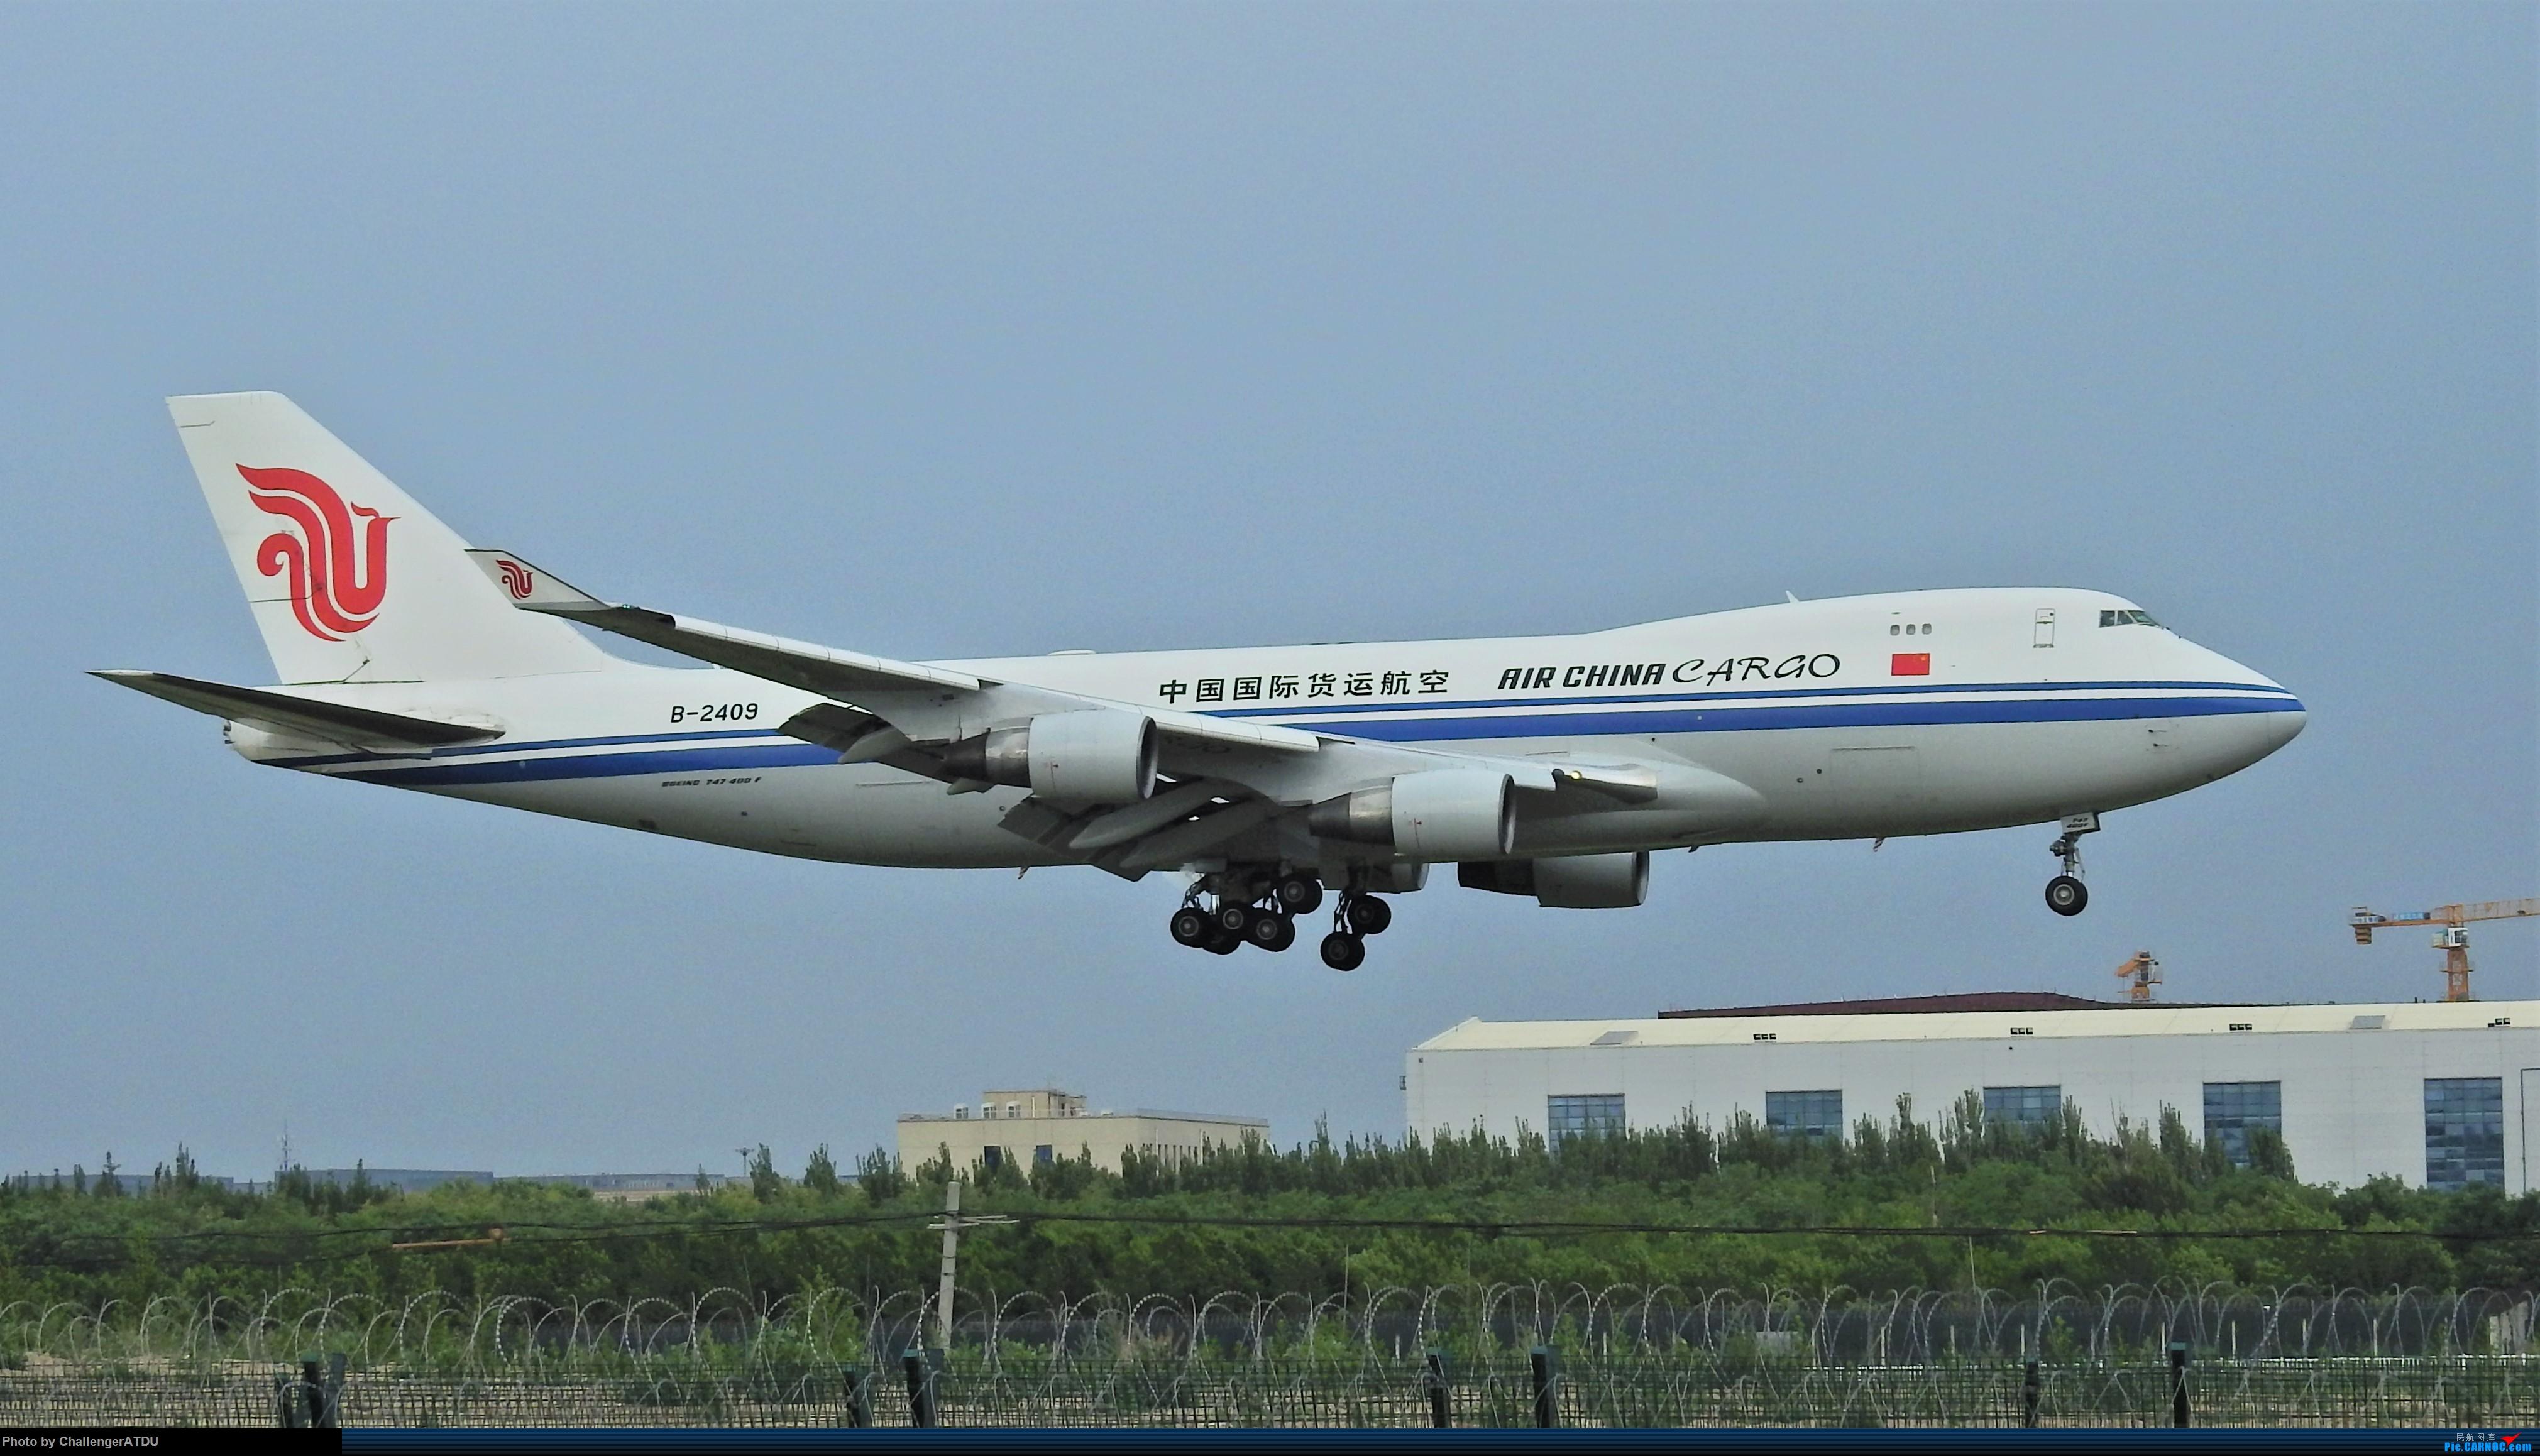 Re:[原创]2020-5-30 萌新のPEK之旅 BOEING 747-400F B-2409 北京首都国际机场